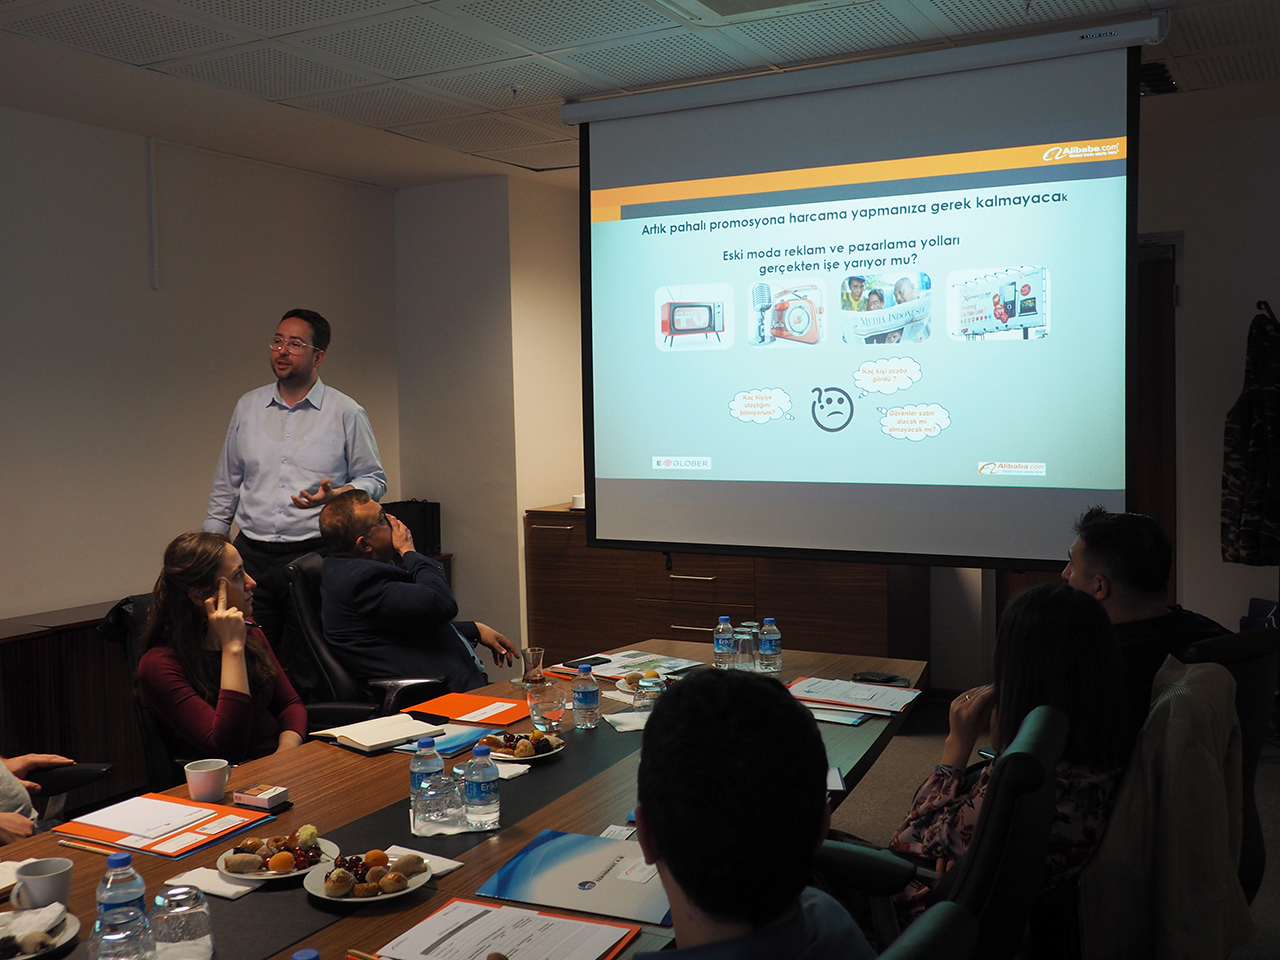 Alibaba.com Hacettepe Teknokentte eğitim verdi